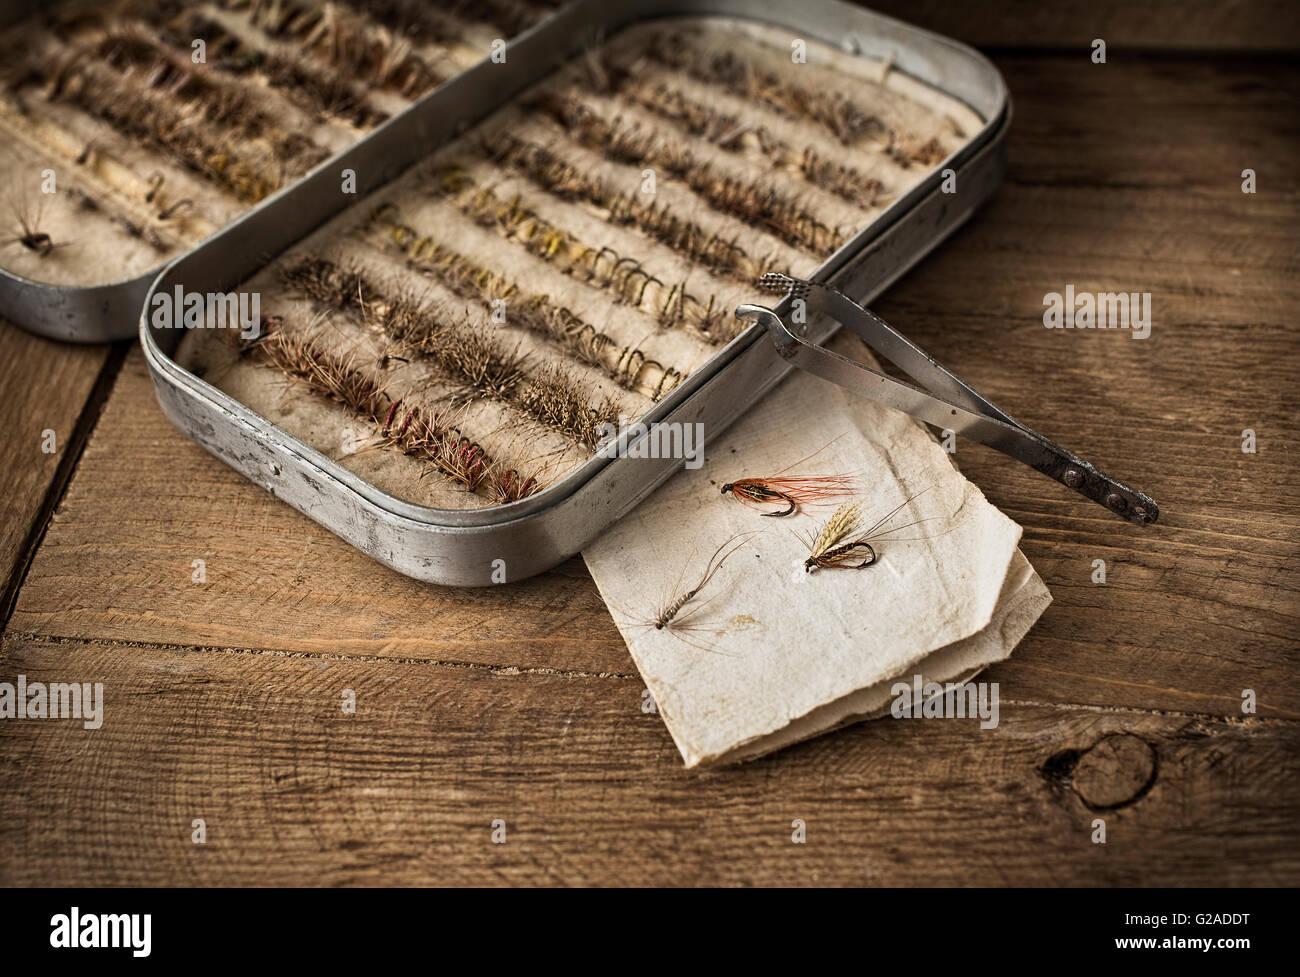 Fishing tackles in box - Stock Image